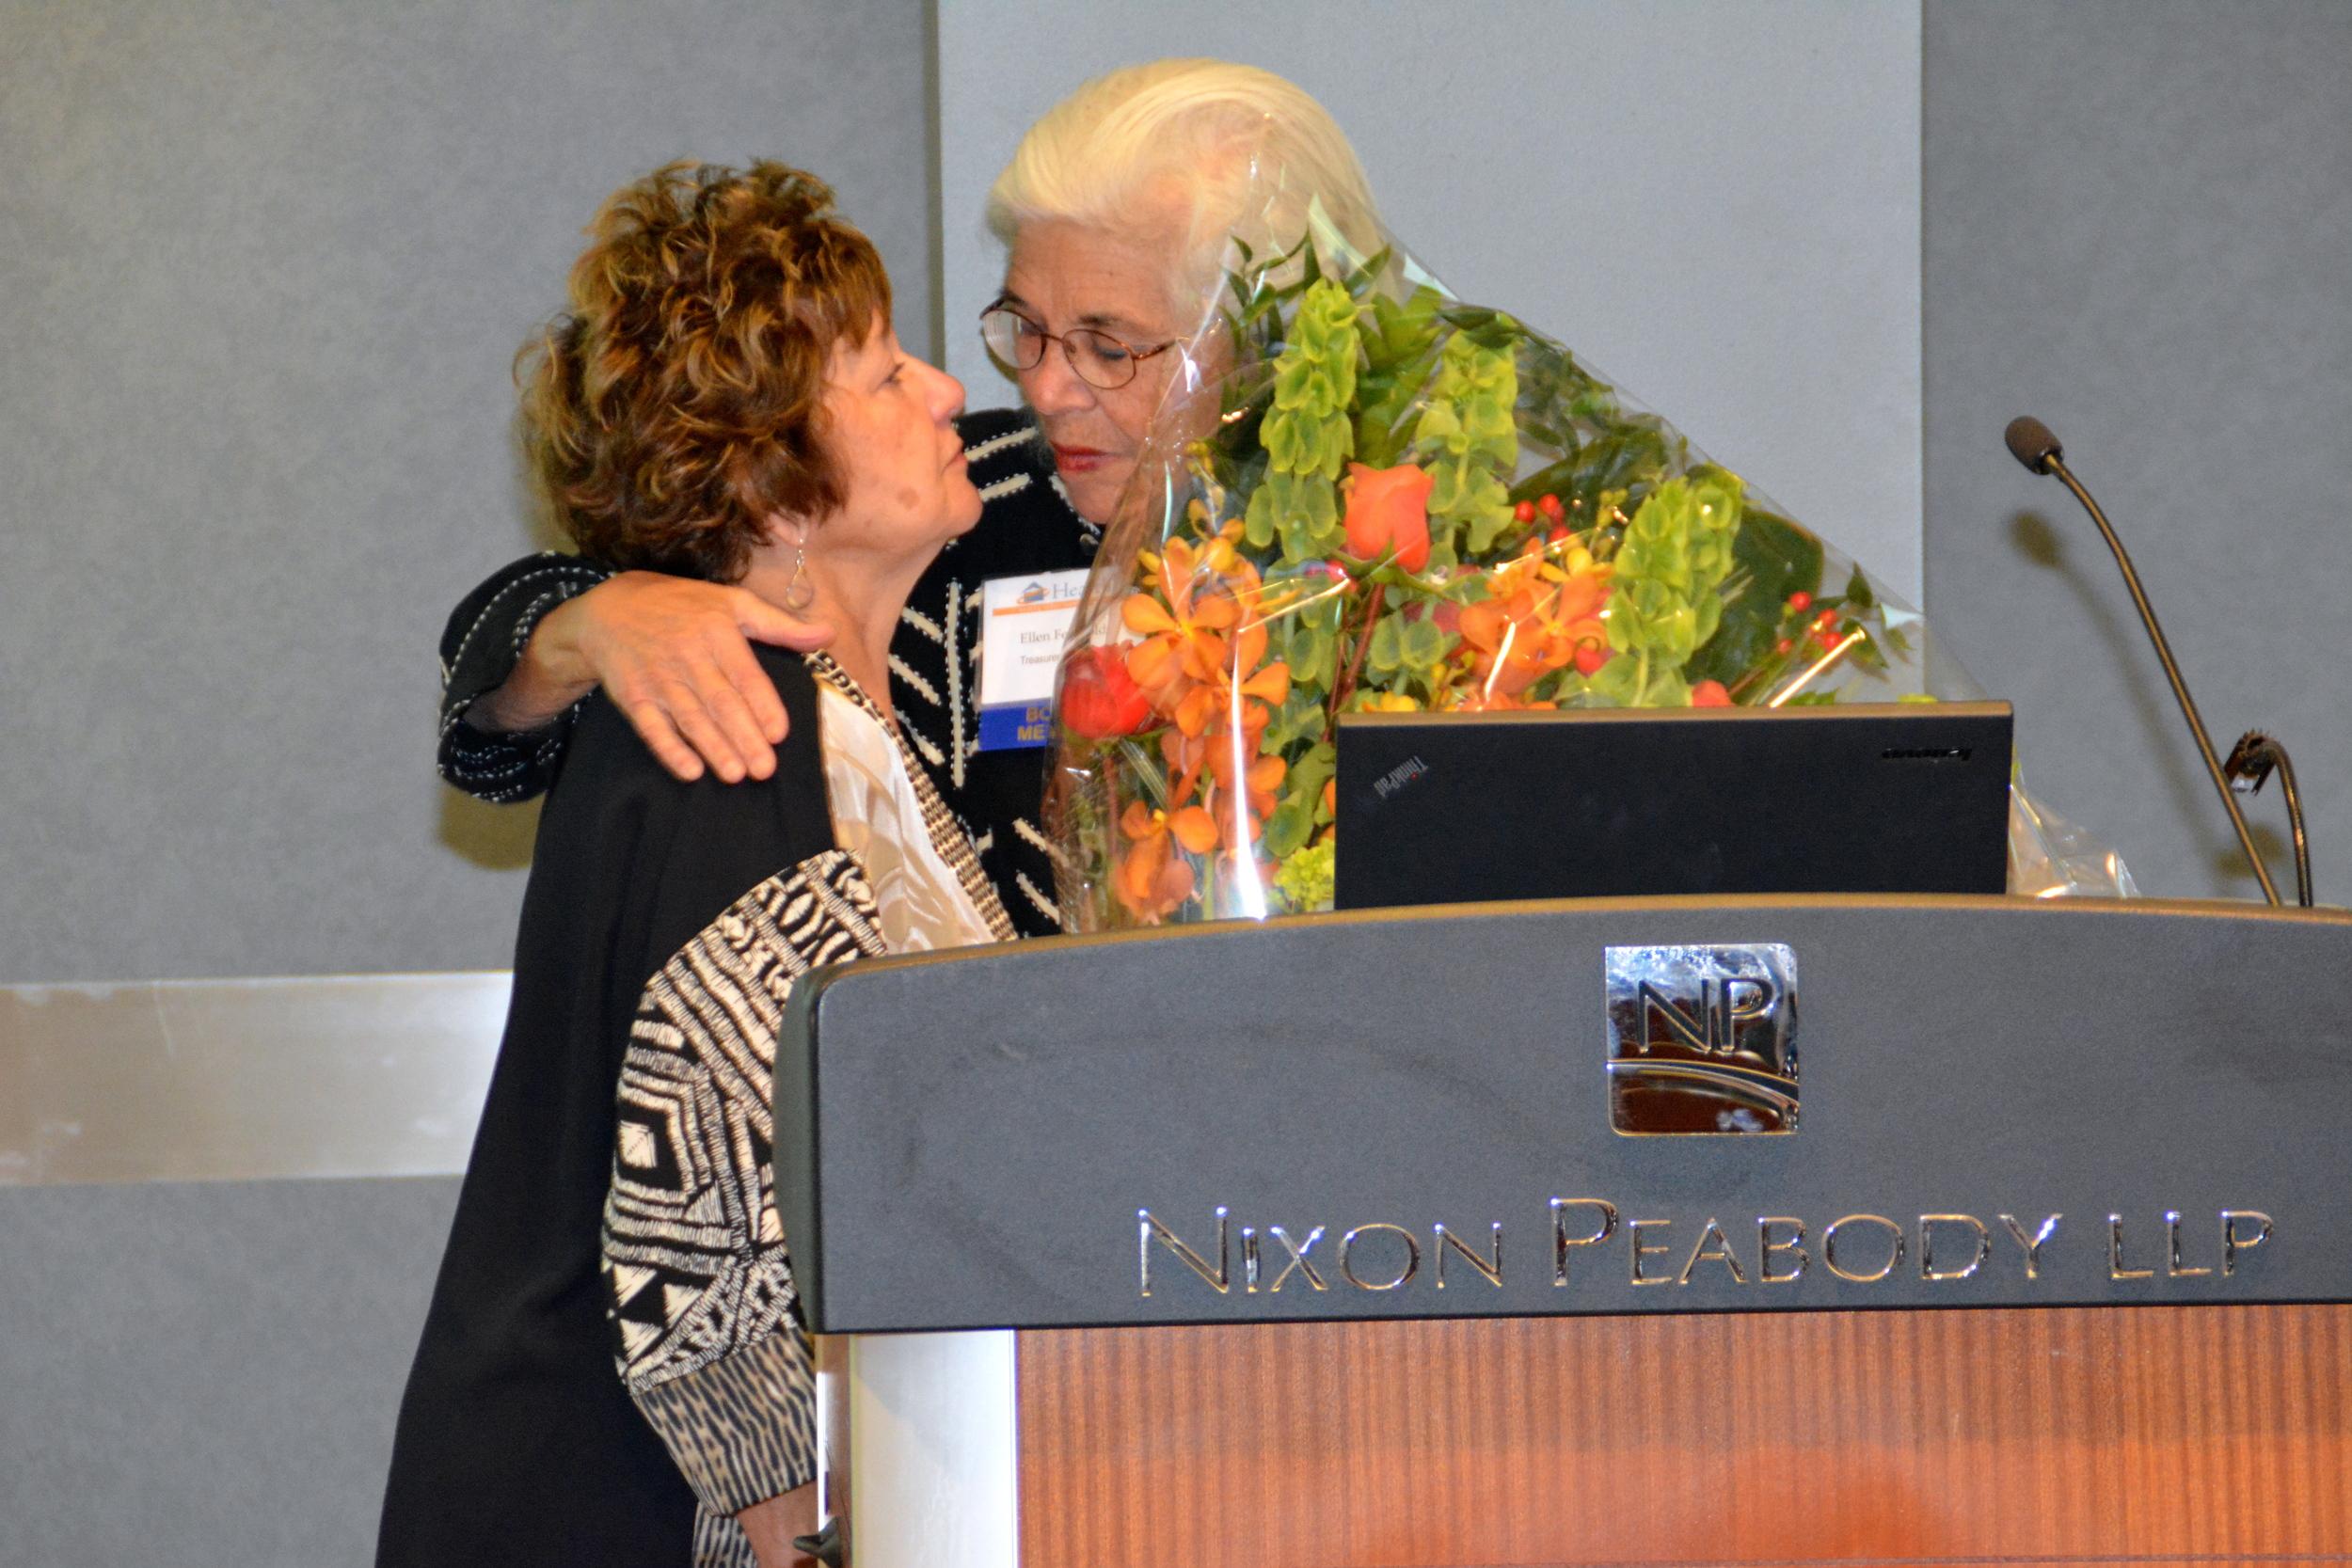 Ellen presents Kathy with flowers.